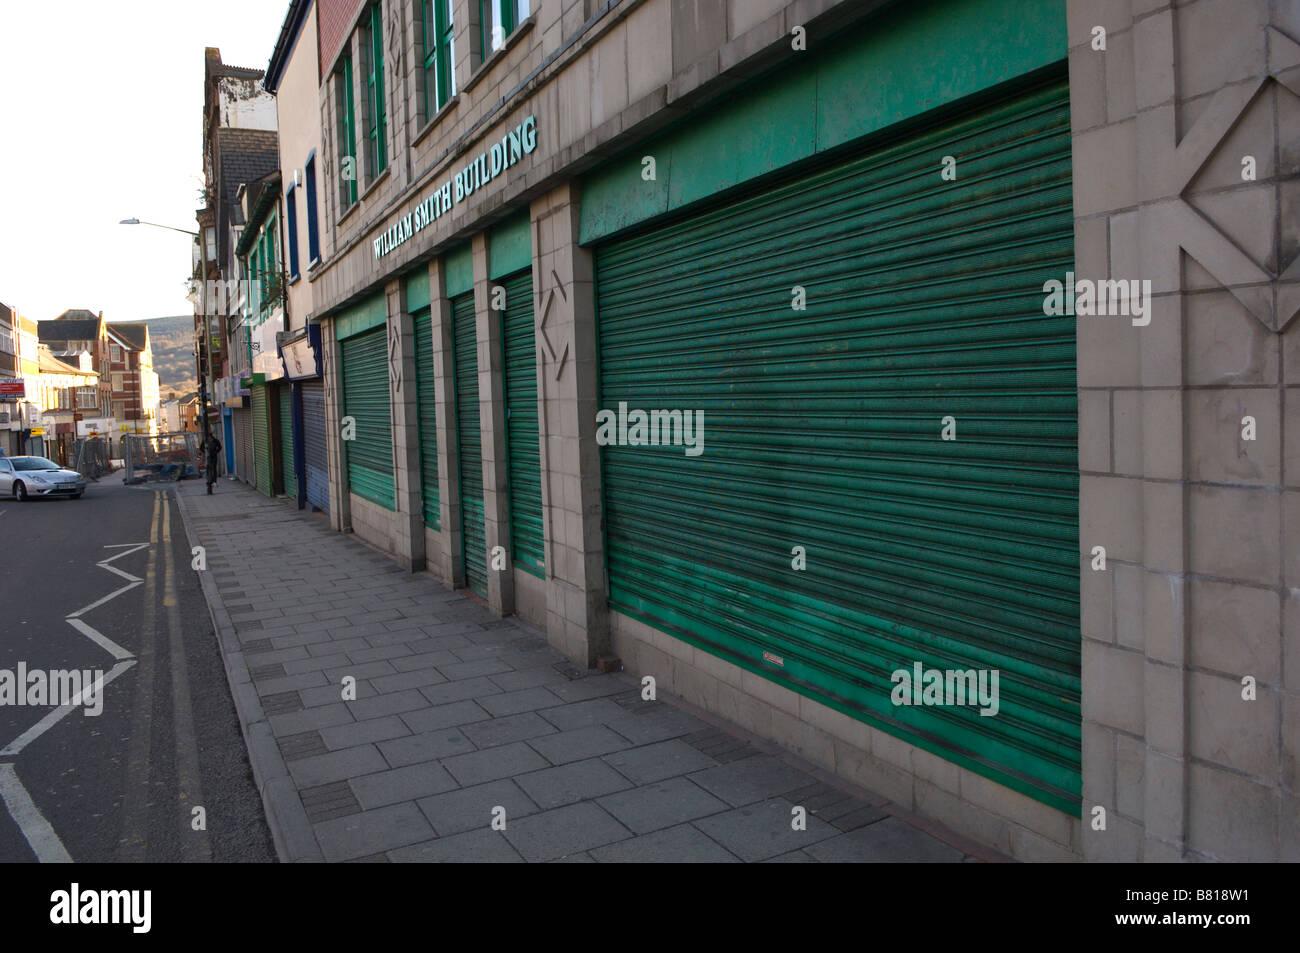 Locked up shop fronts Merthyr Tydfil Wales United Kingdom Europe - Stock Image